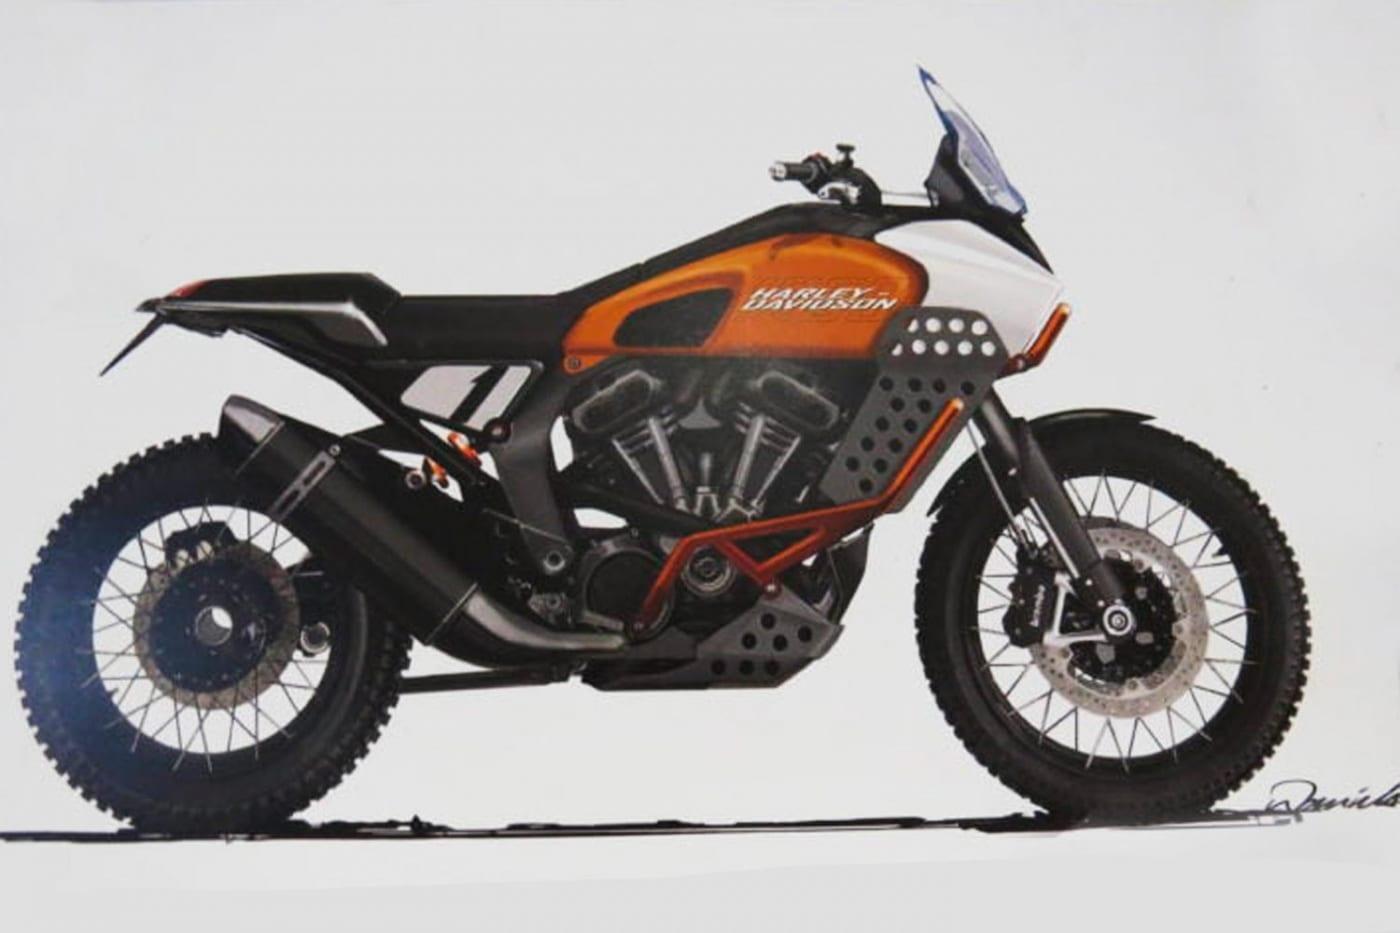 Harley-Davidson Prototyp